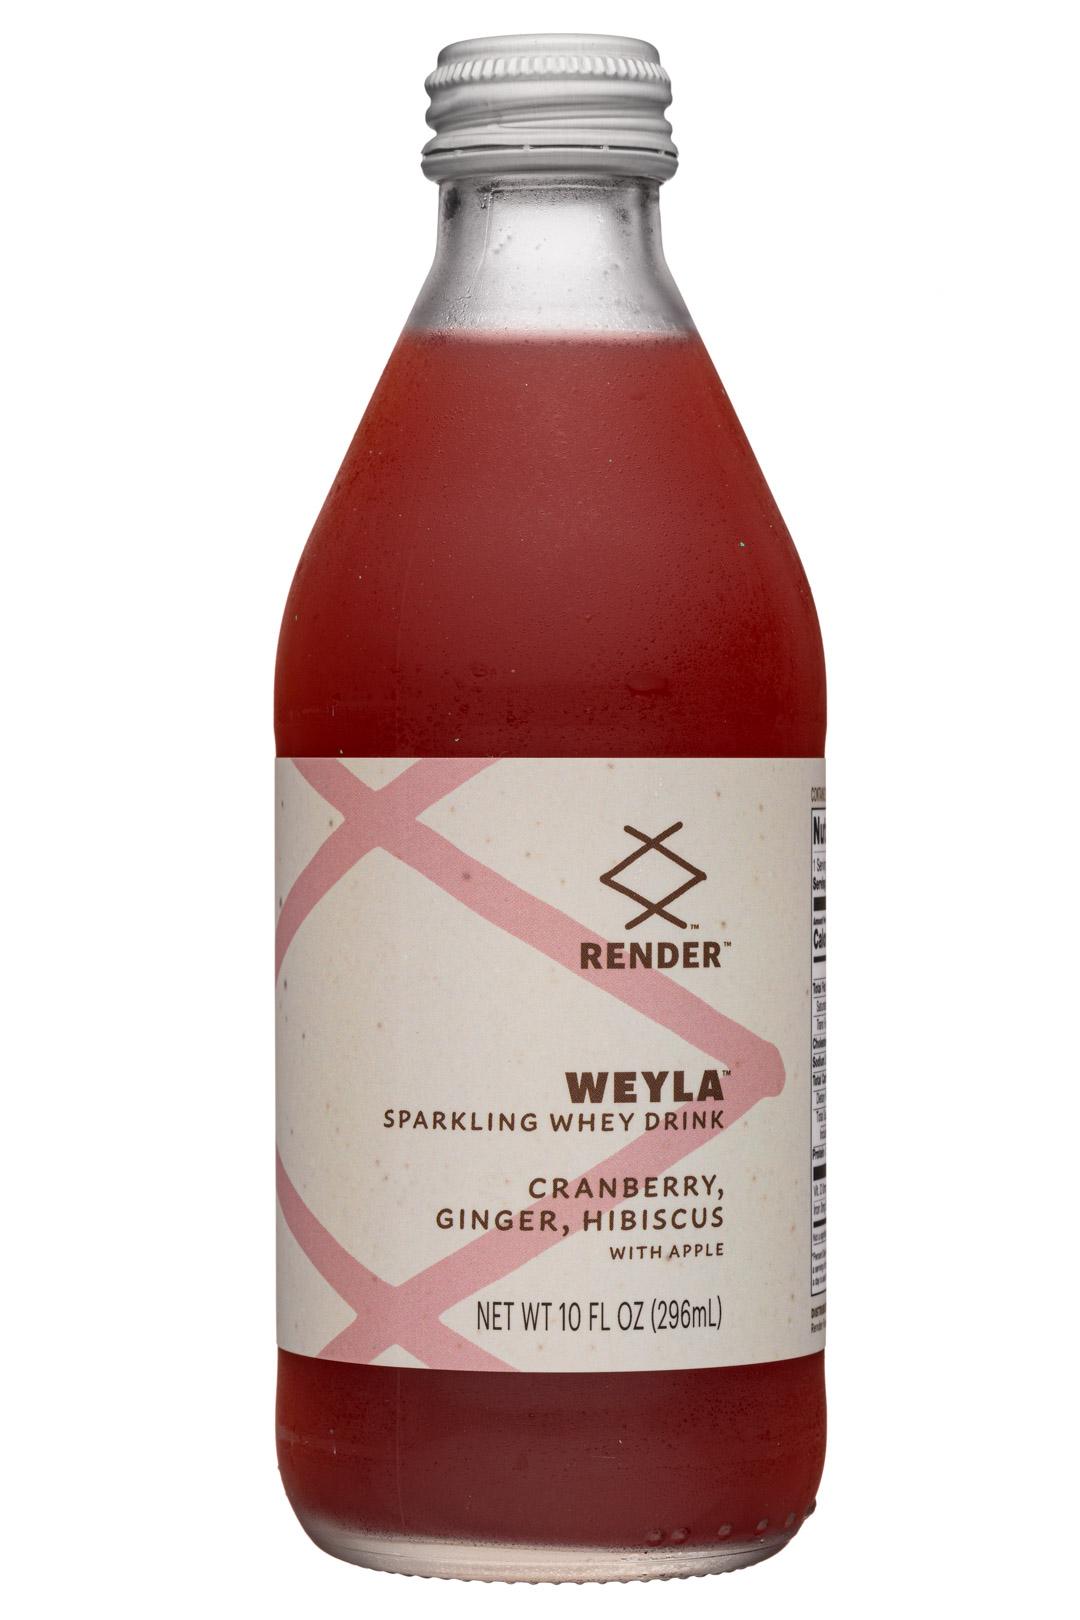 Weyla: Cranberry, Ginger, Hibiscus with Apple